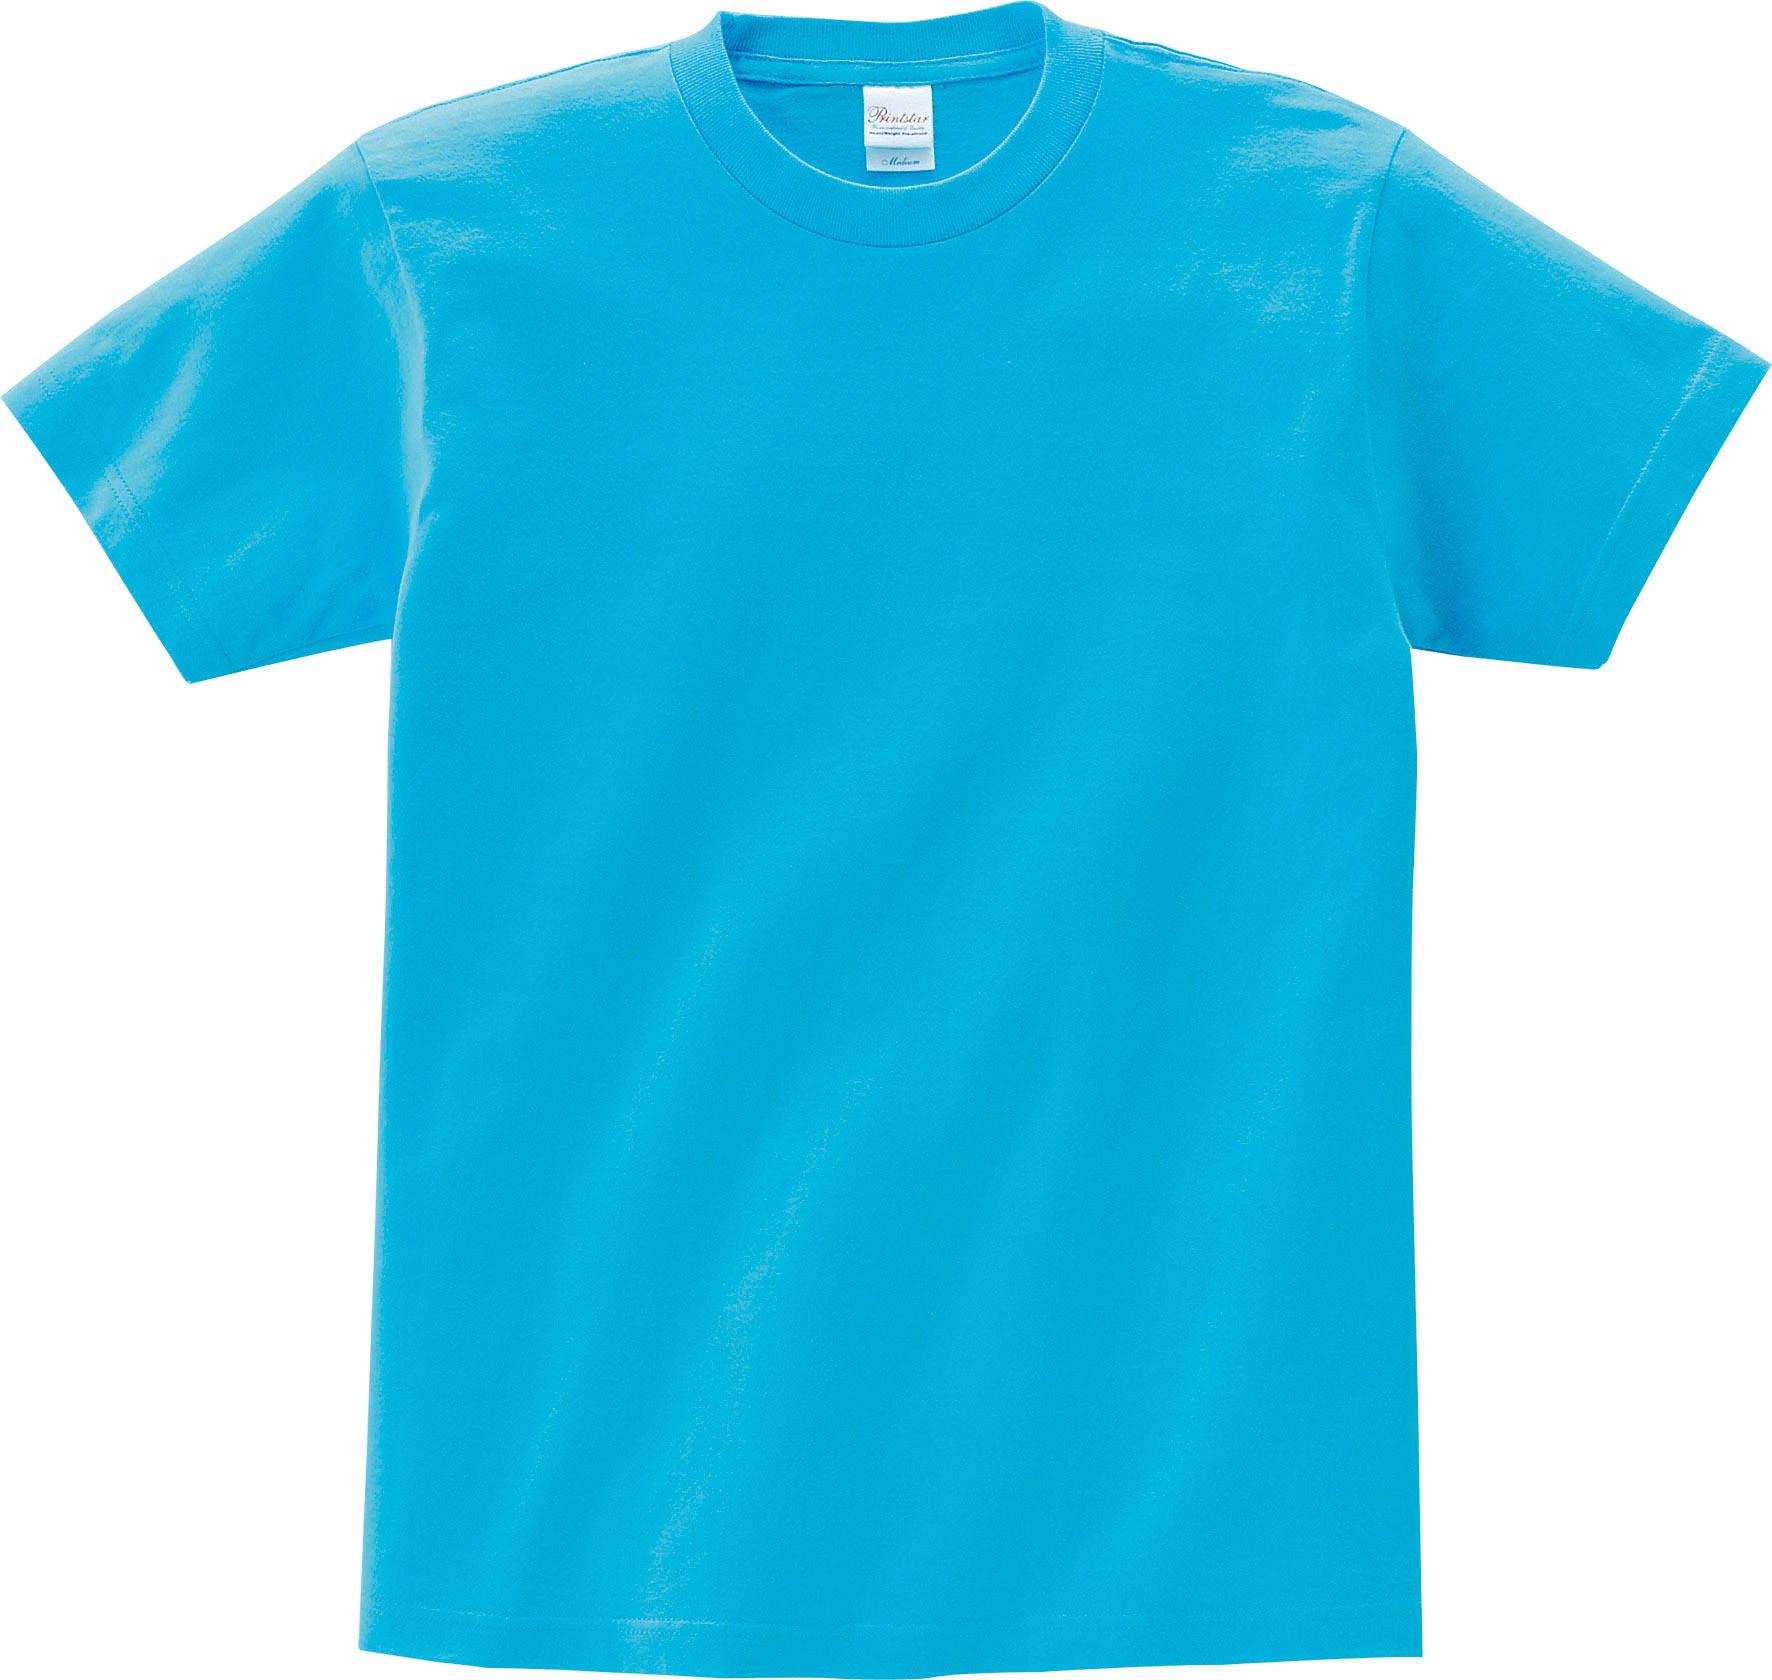 00085-CVT 5.6オンス・ヘビーウェイトTシャツ - 199-シーブルー, XXXL